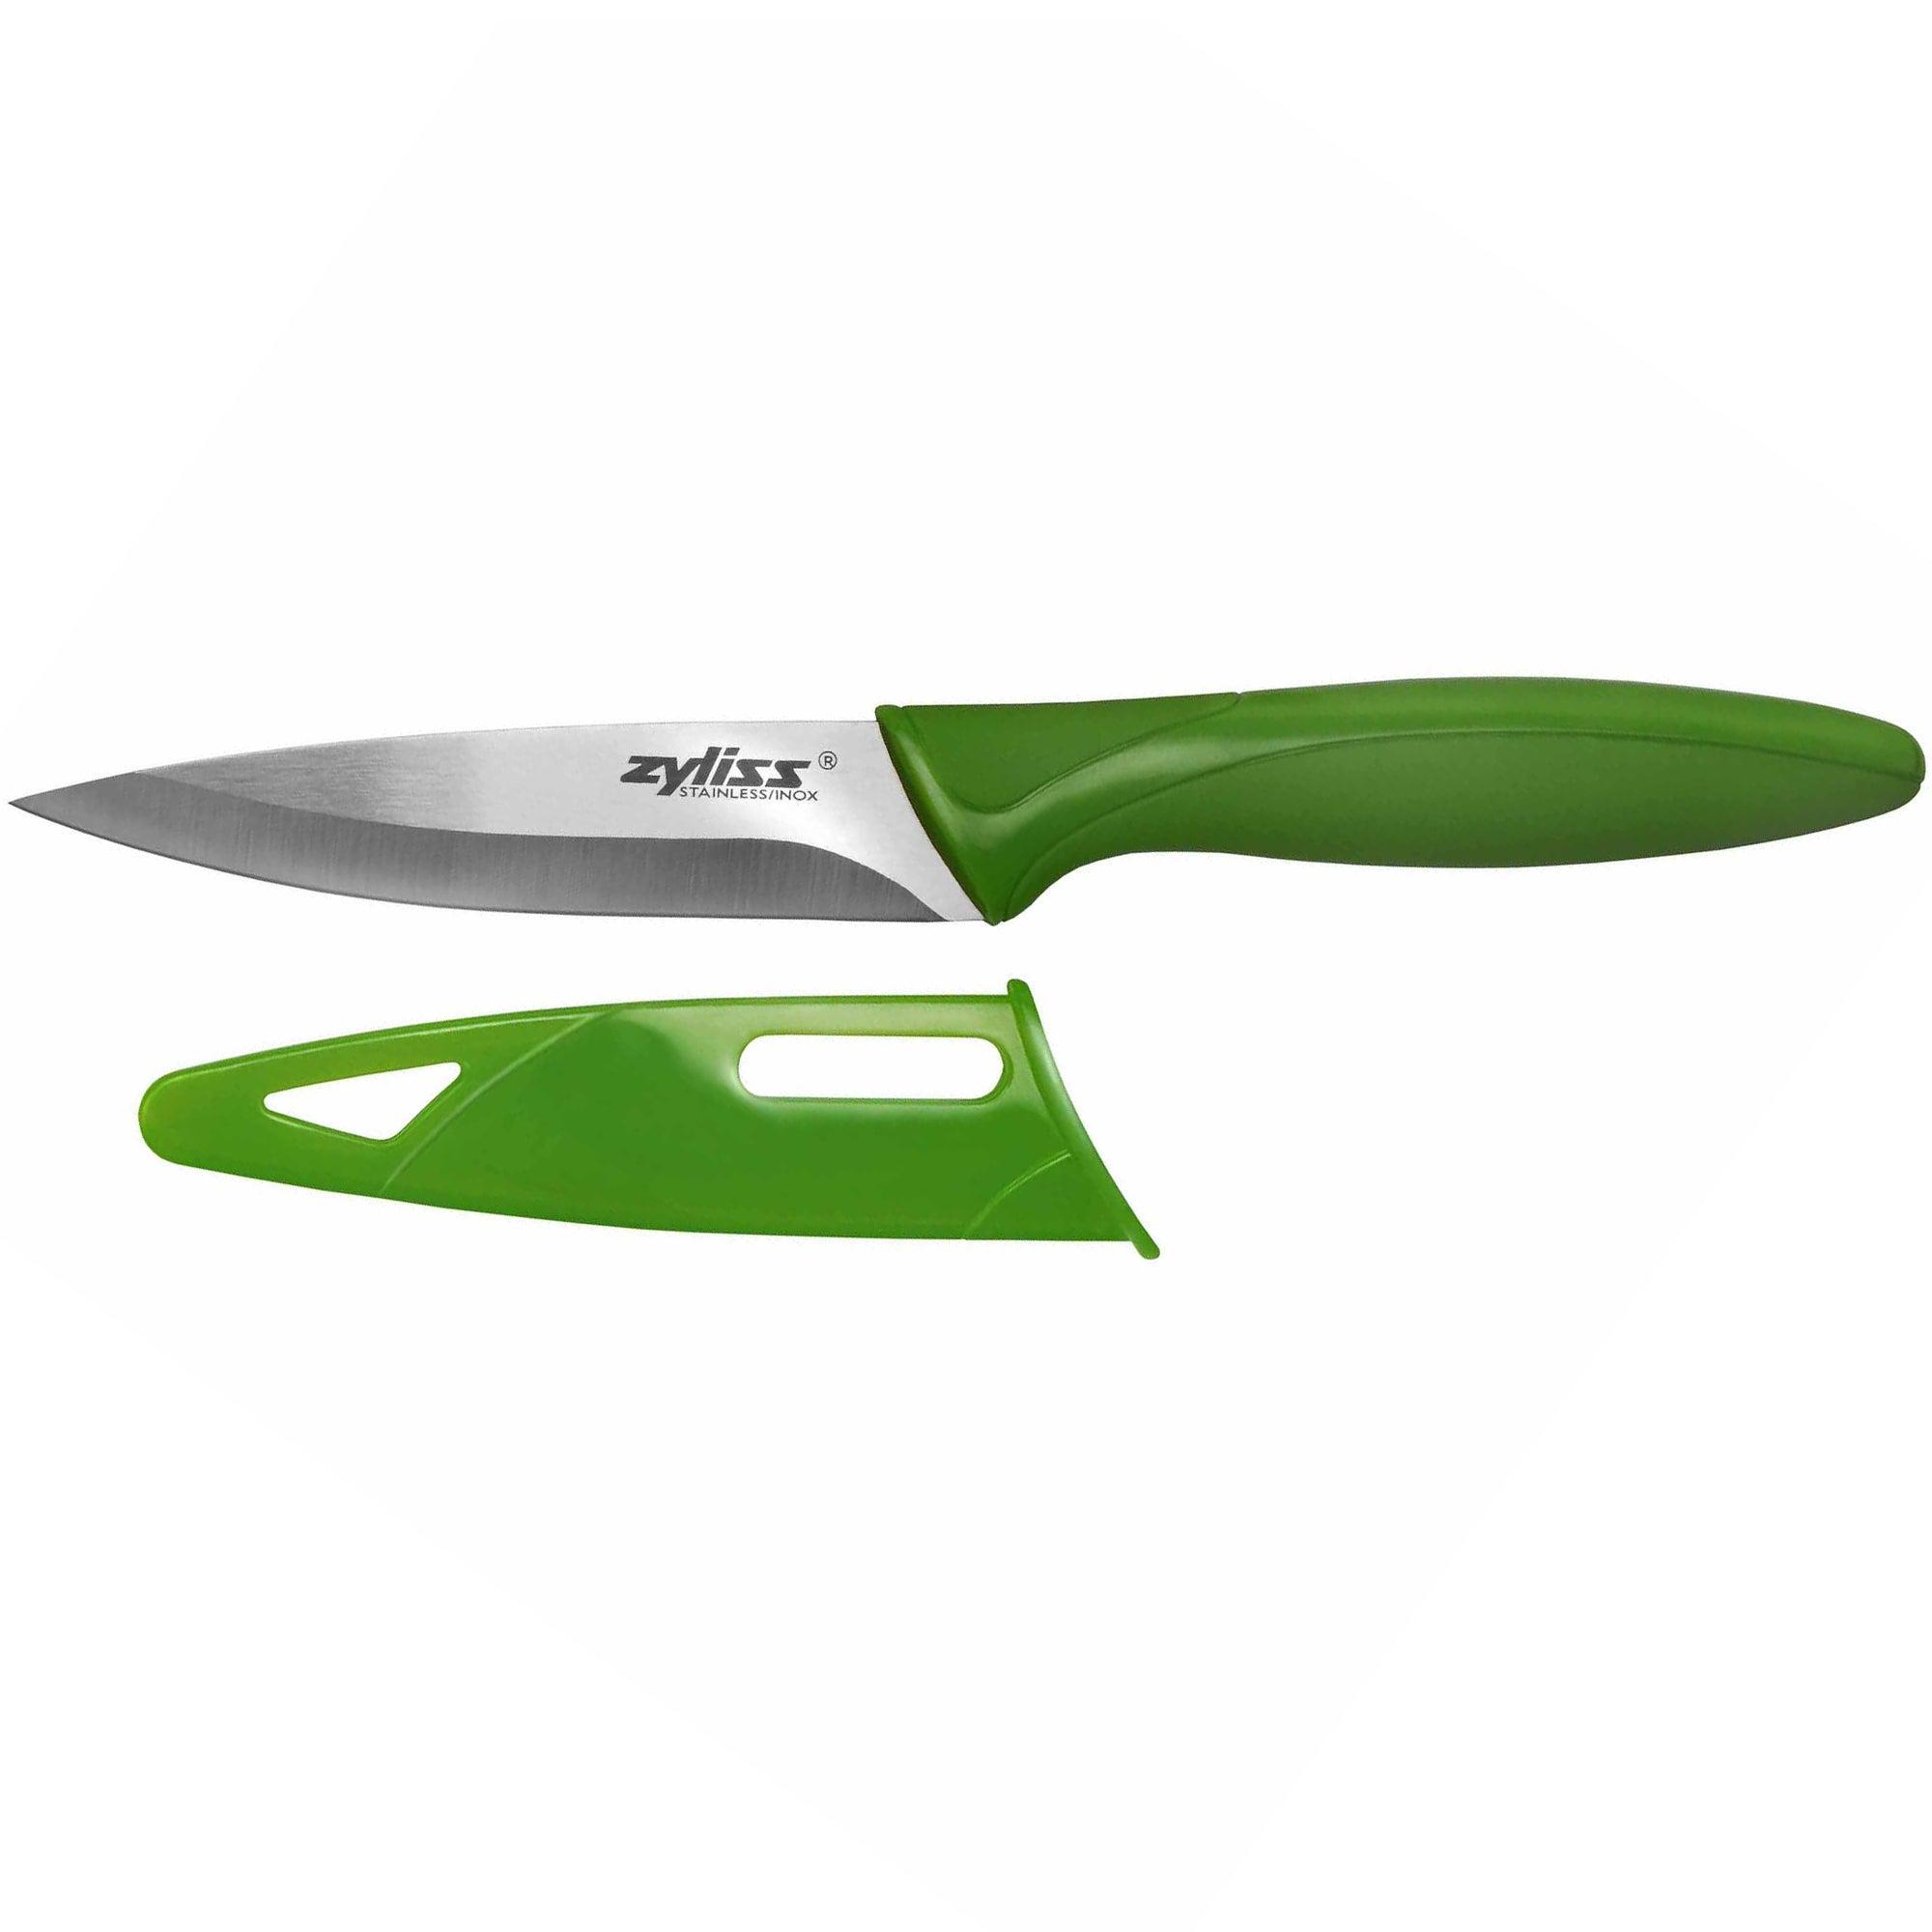 Zyliss Paring Knife